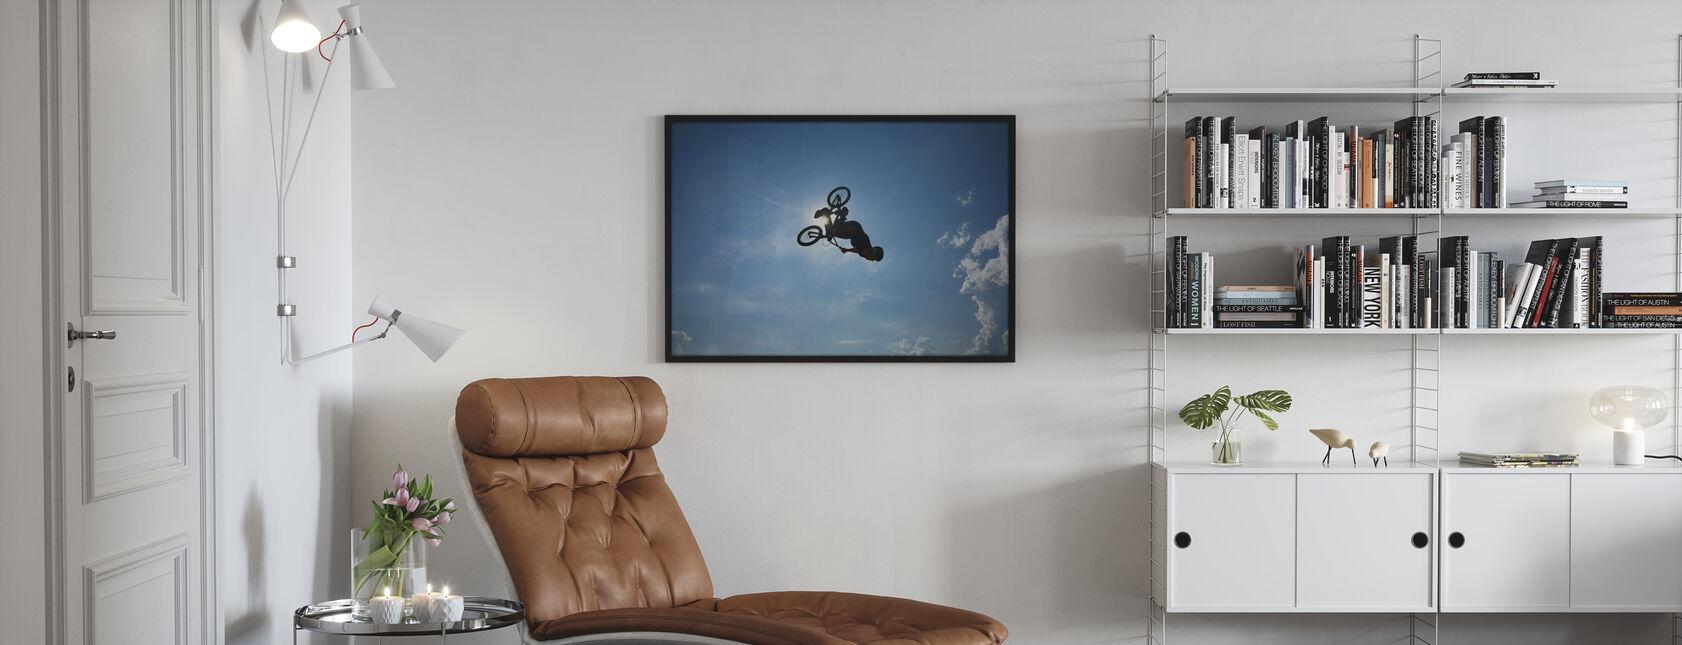 BMX Backflip - Poster - Living Room